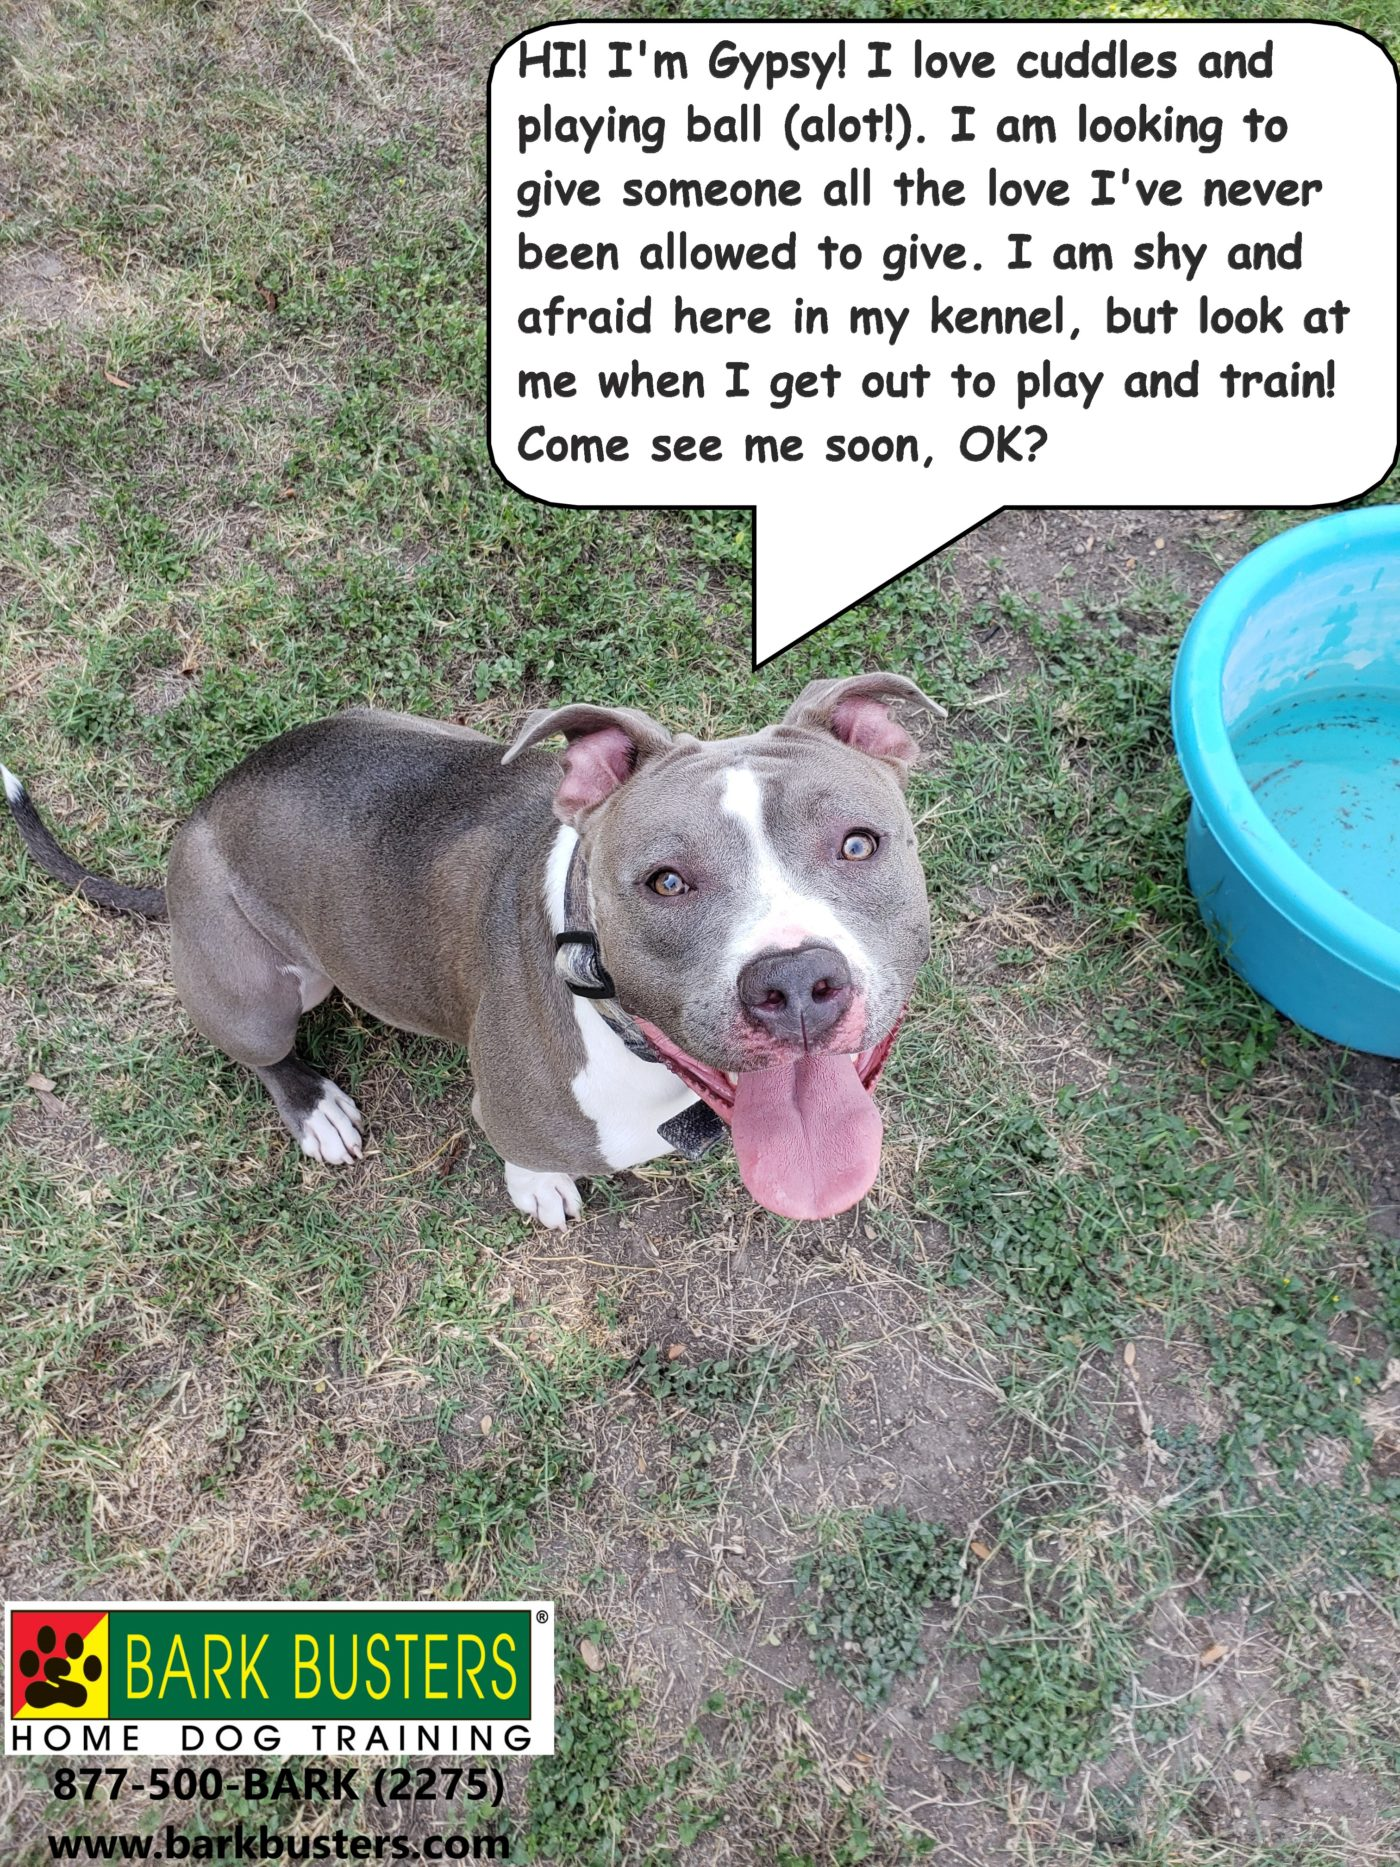 #pitbulldogtraining #bestdogtrainingpflugerville #bestdogtrainingroundrock #shelterdogs #dogsofbarkbusters